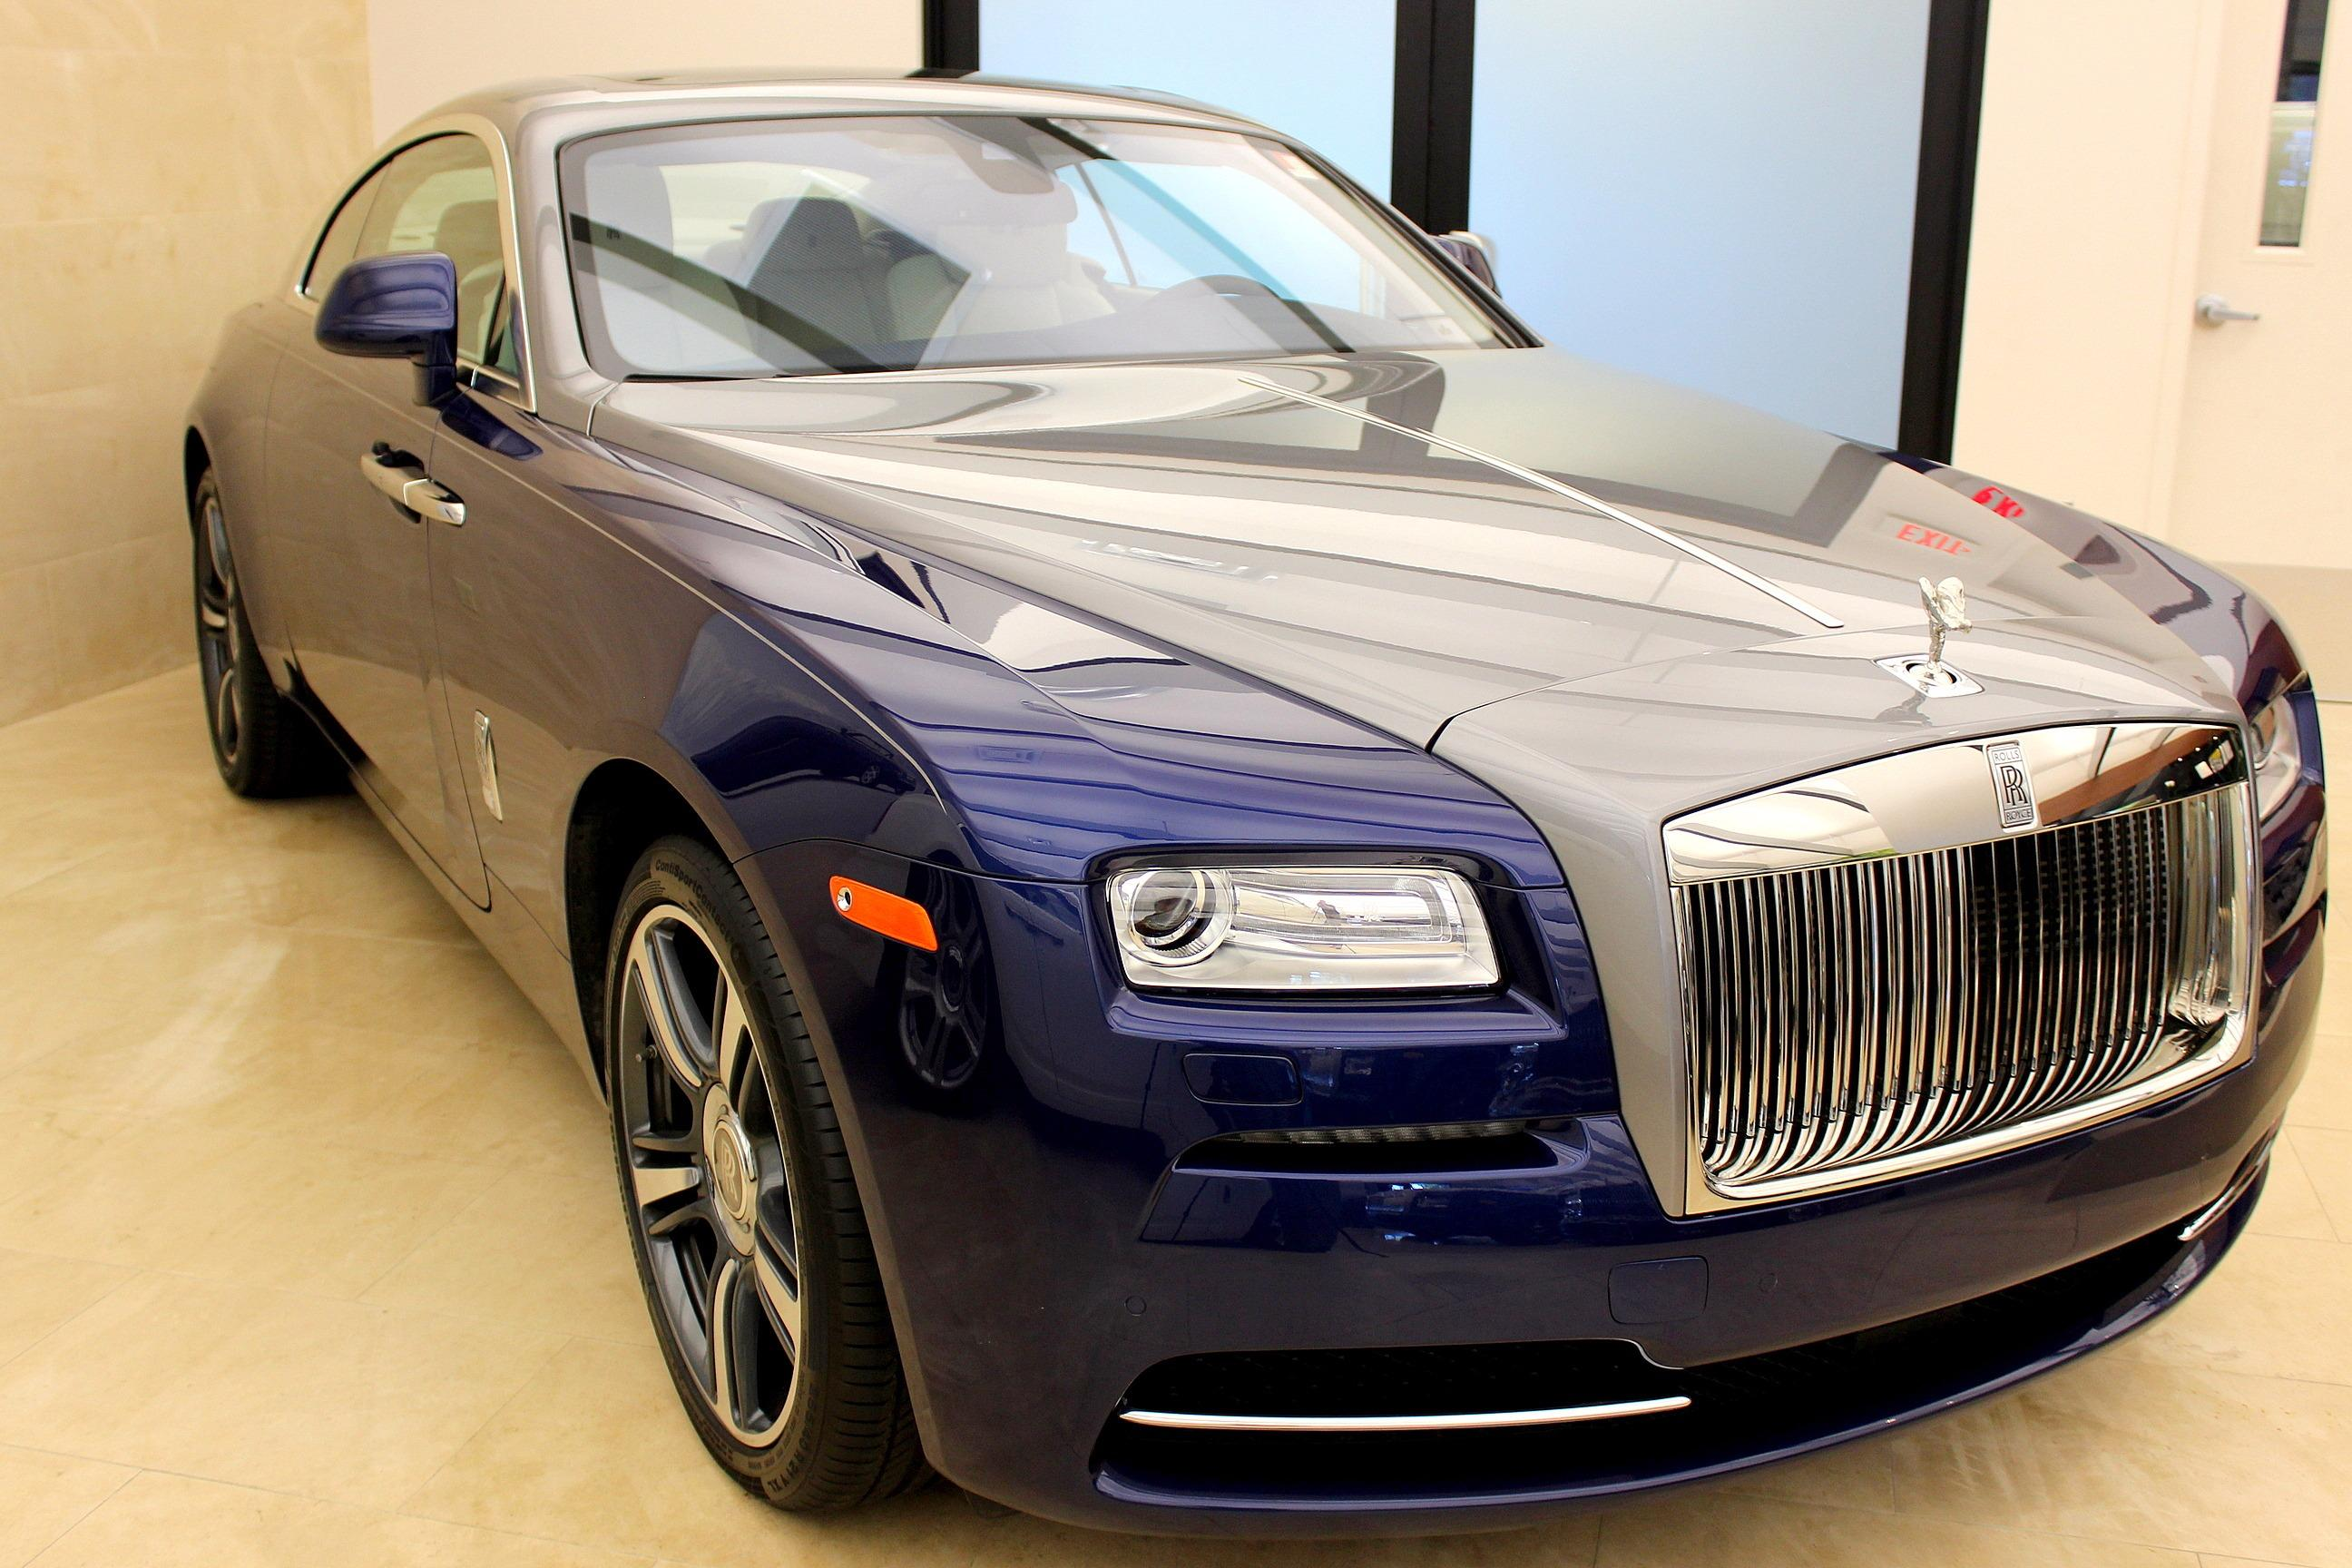 Rolls royce motor cars of new england at 529 boston post for Rolls royce motor cars